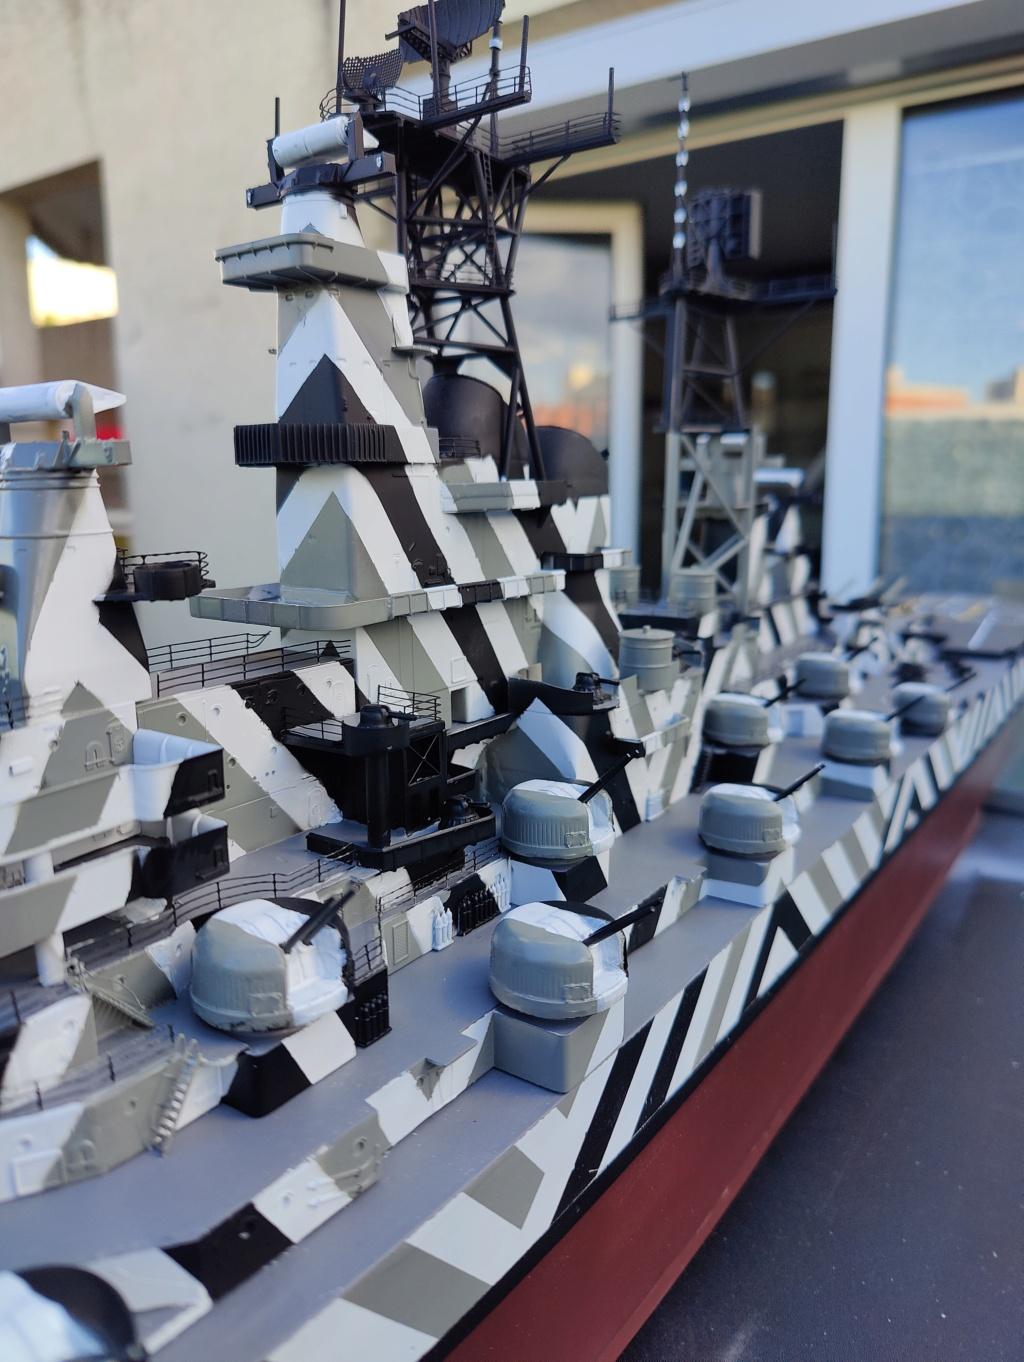 [Uchronie] USS Lake Michigan (base Iowa Trumpeter 1/200°) par hibikitokay - Page 7 Img_2123